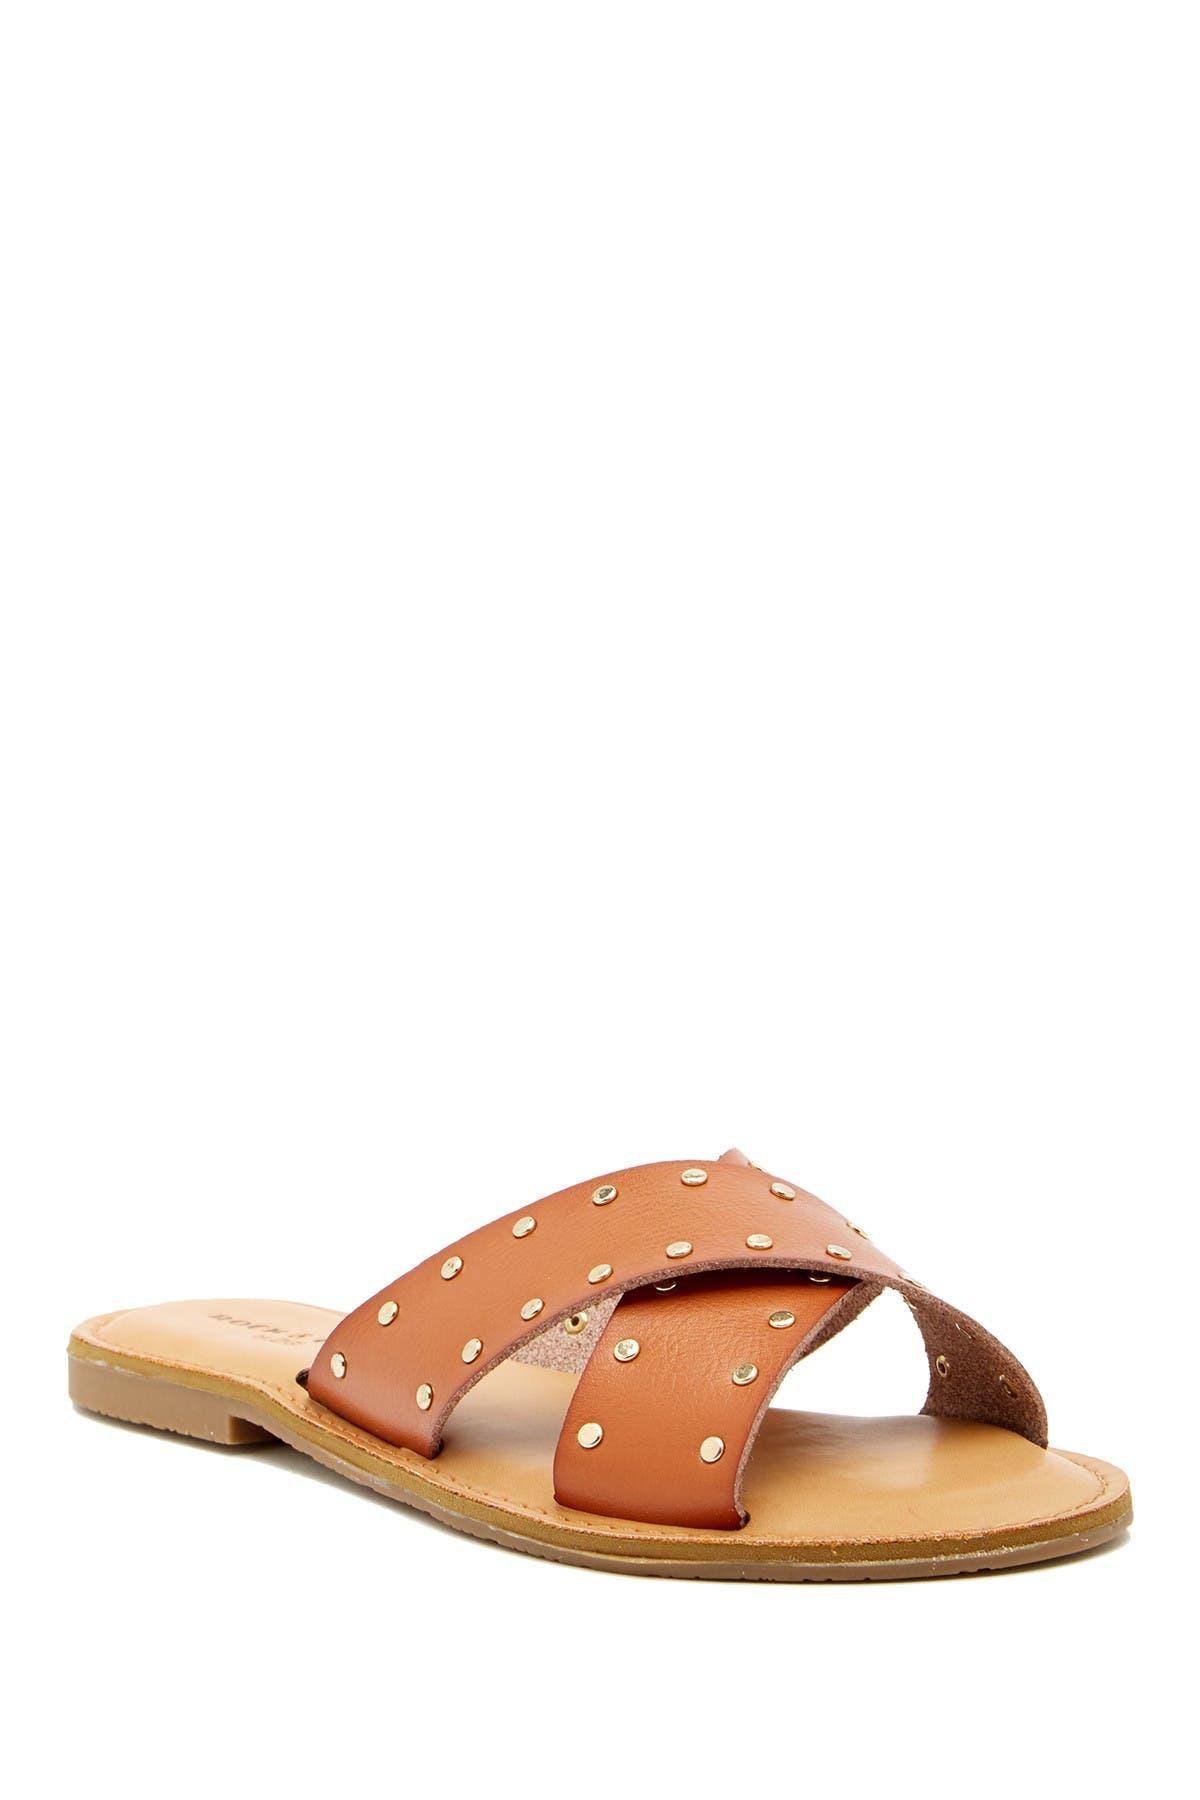 Image of Rock & Candy Bradi Cross Band Slide Sandal